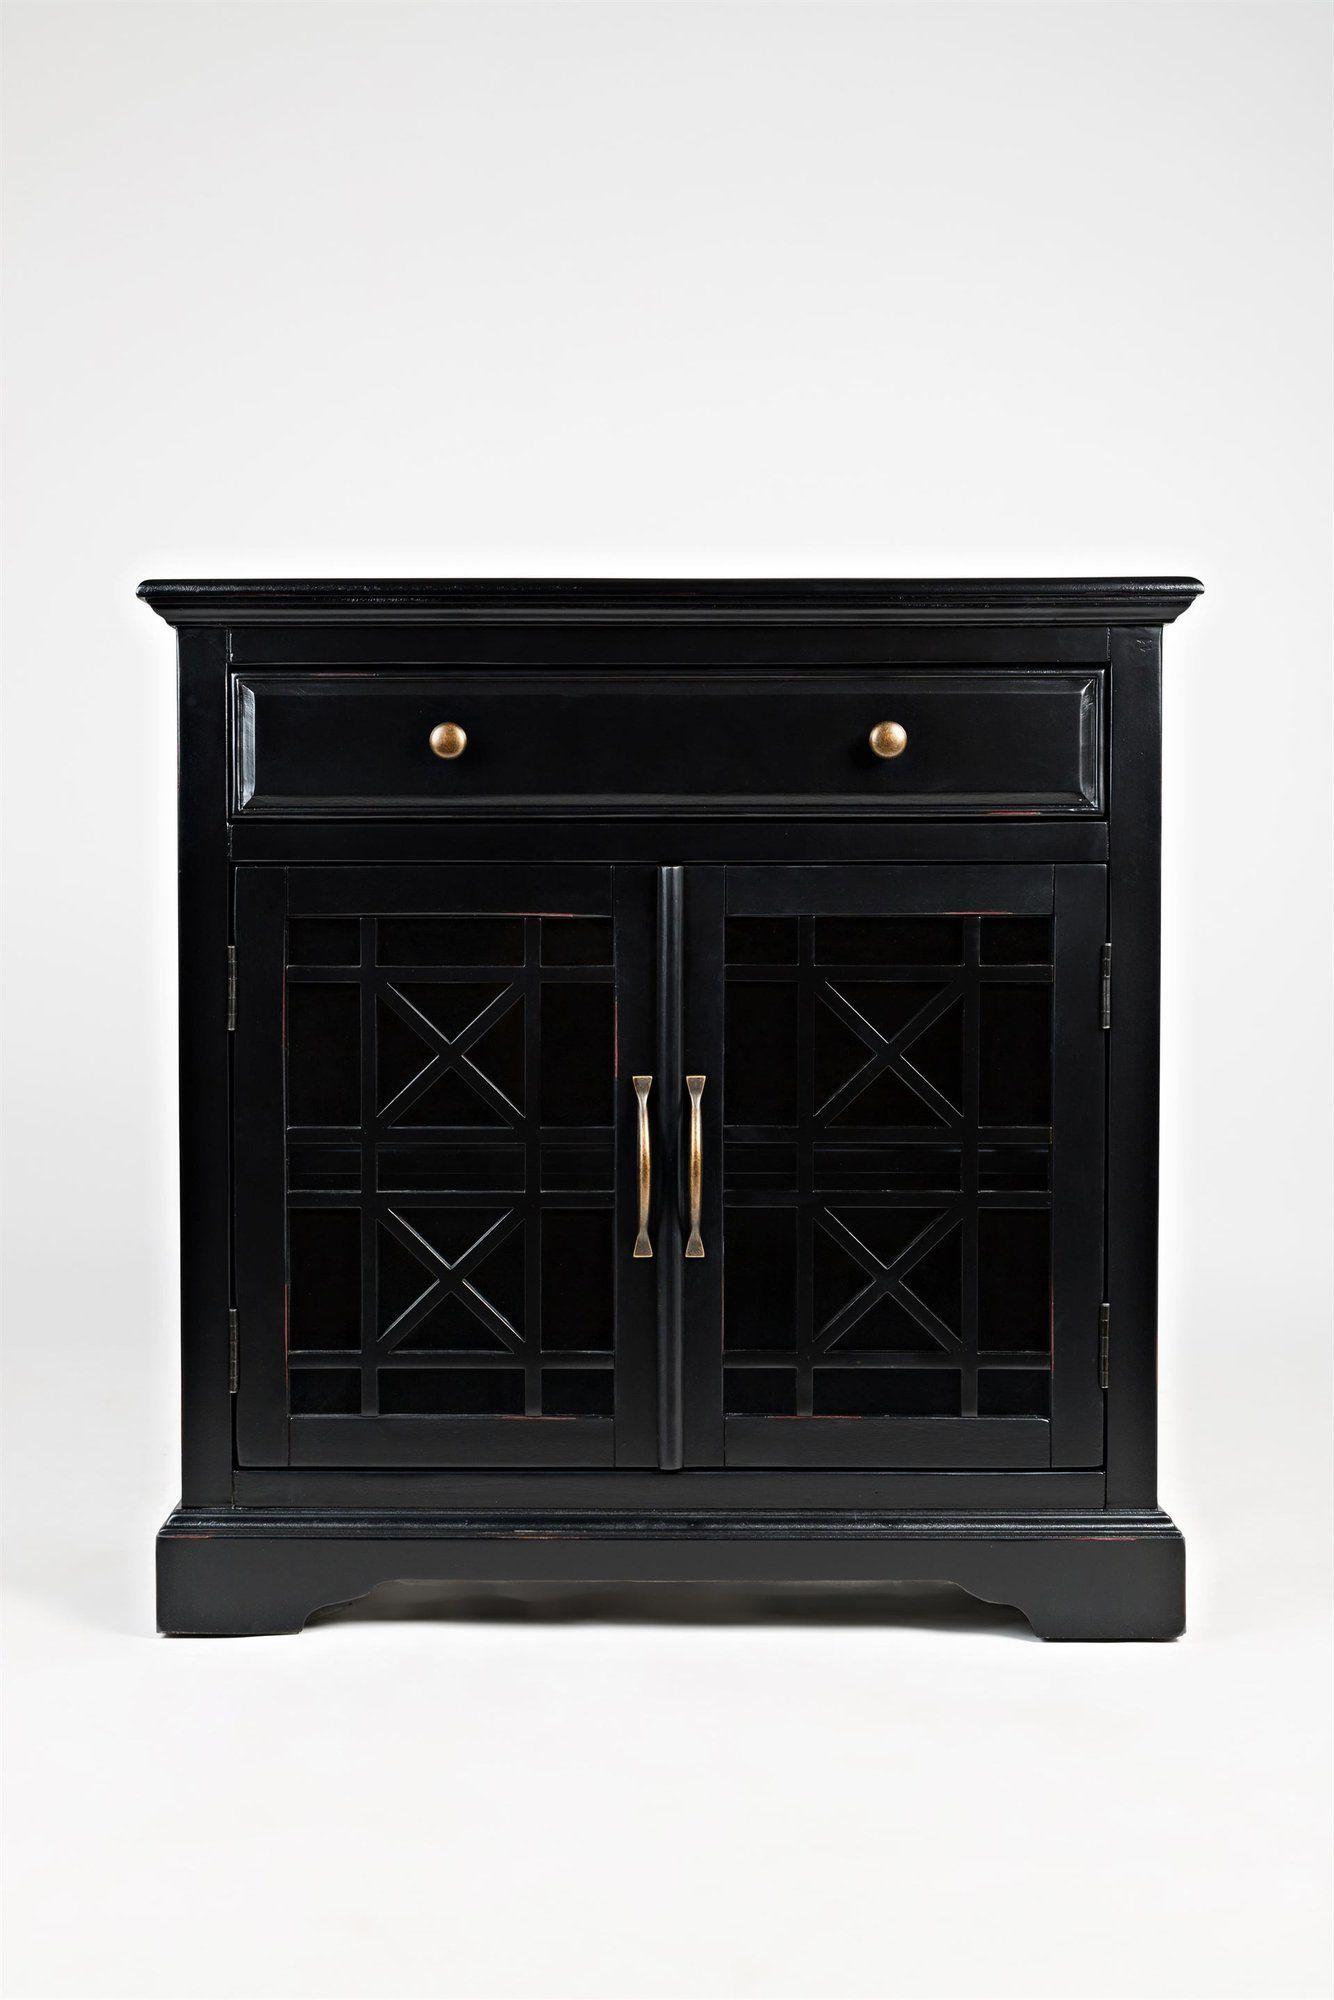 AV275-32 Komoda 2D/1S Avola Antique Black